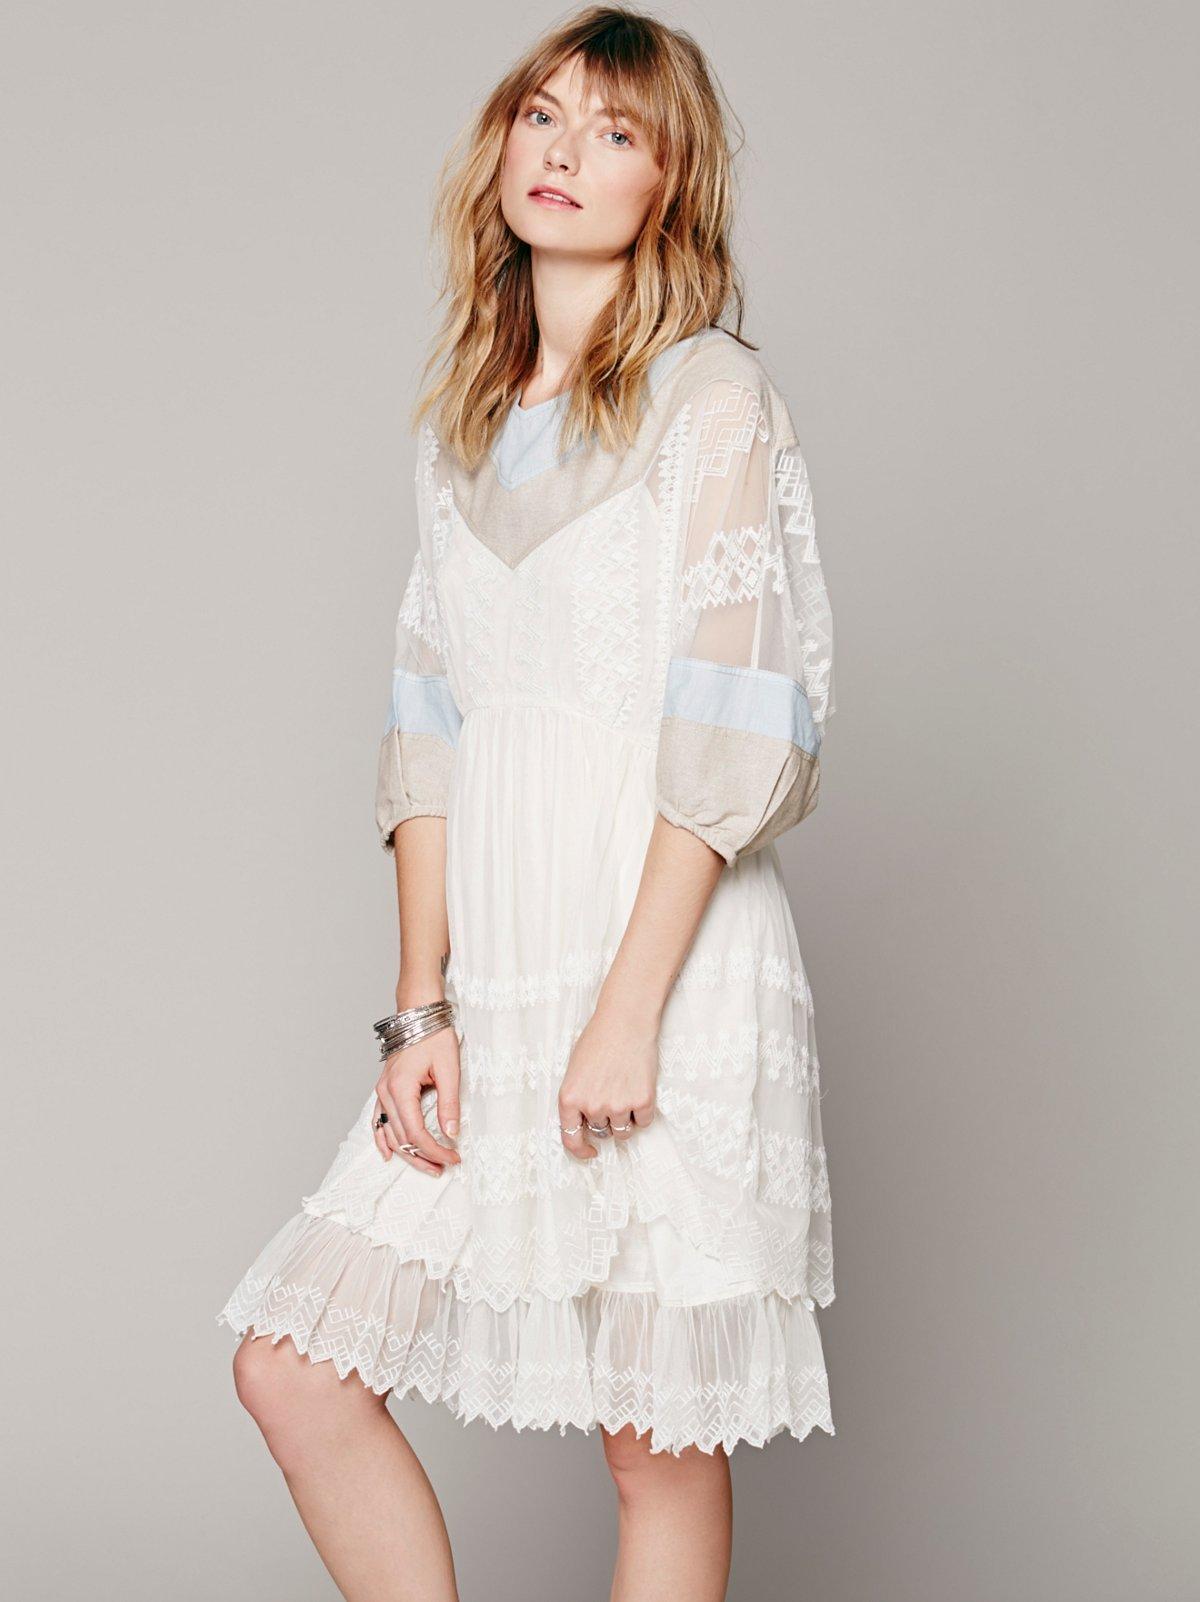 FP New Romantics 9 to 5 Patchwork Dress